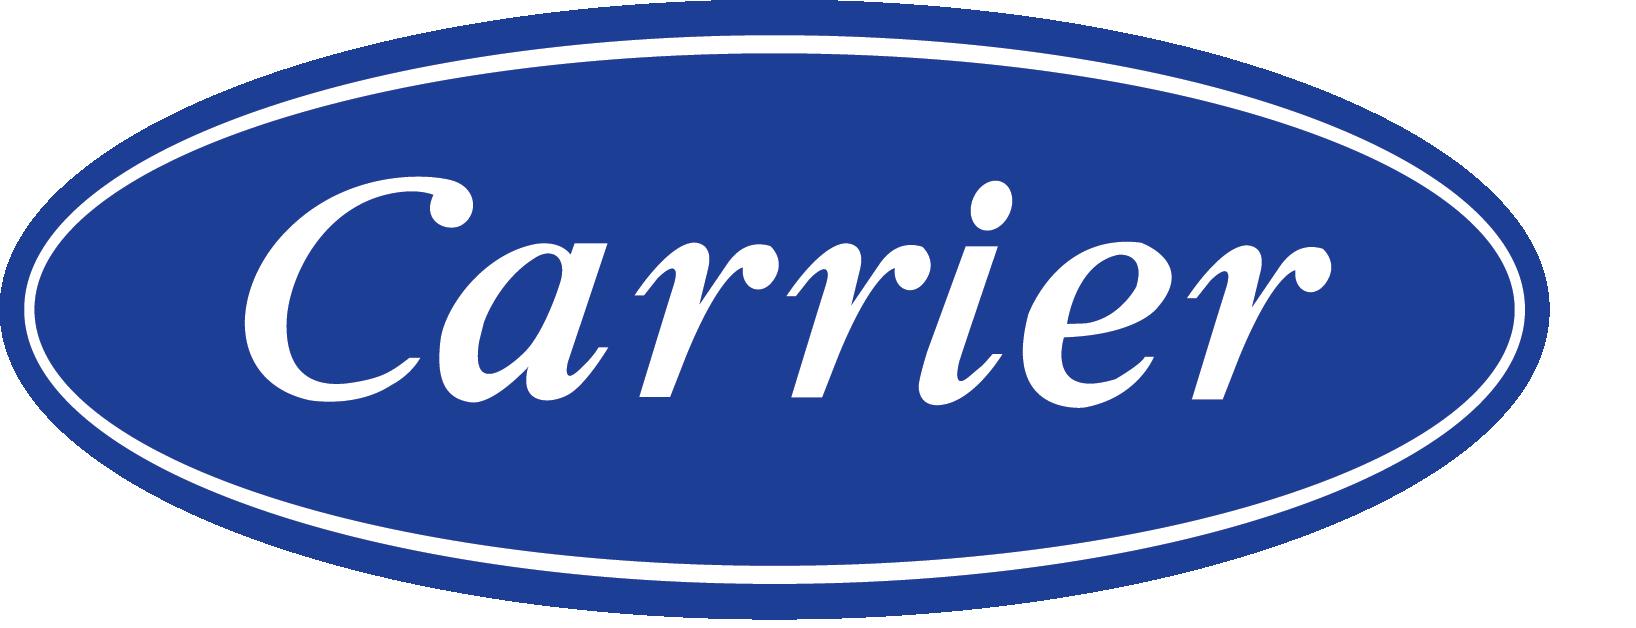 Carrier w_o service mark